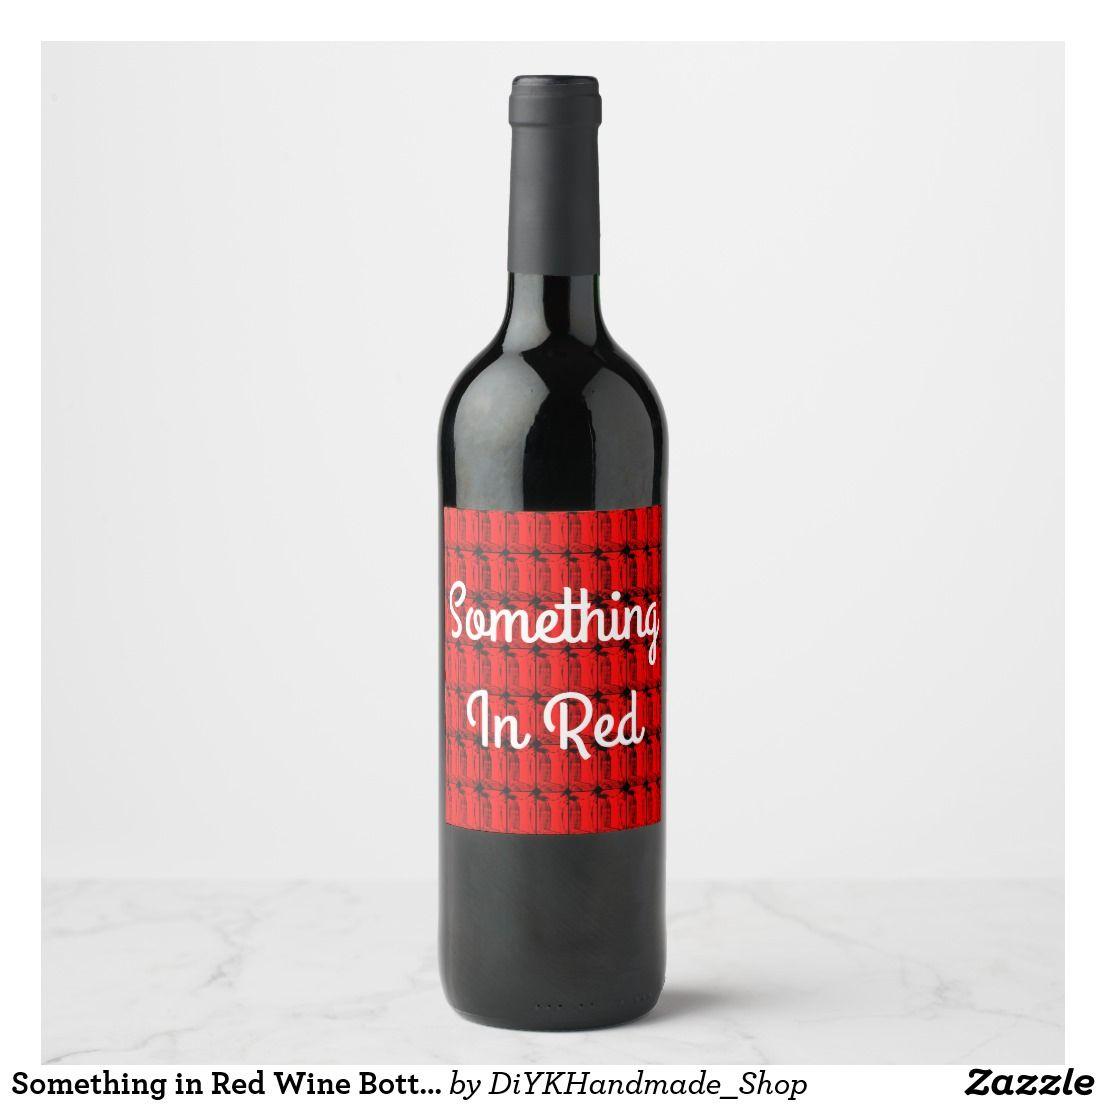 Something In Red Wine Bottle Label Zazzle Com Red Wine Bottle Label Wine Bottle Labels Red Wine Bottle